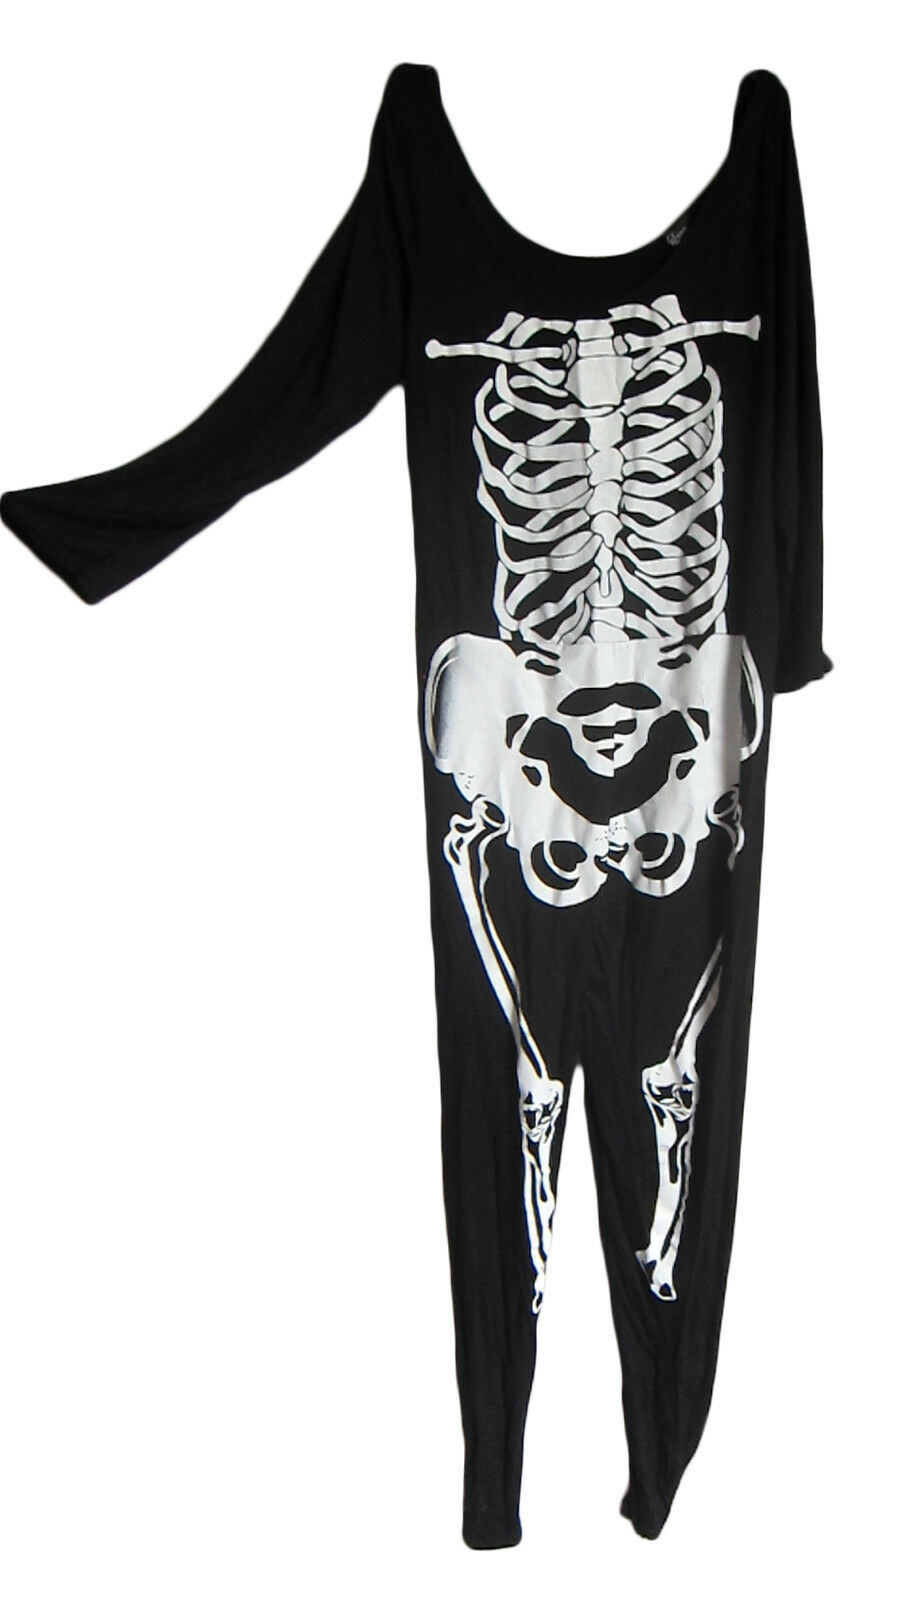 HALOWEEN UK 20/ 22 Skeleton Bones Suit Jumpsuit Fancy Dress Costume Outfit New